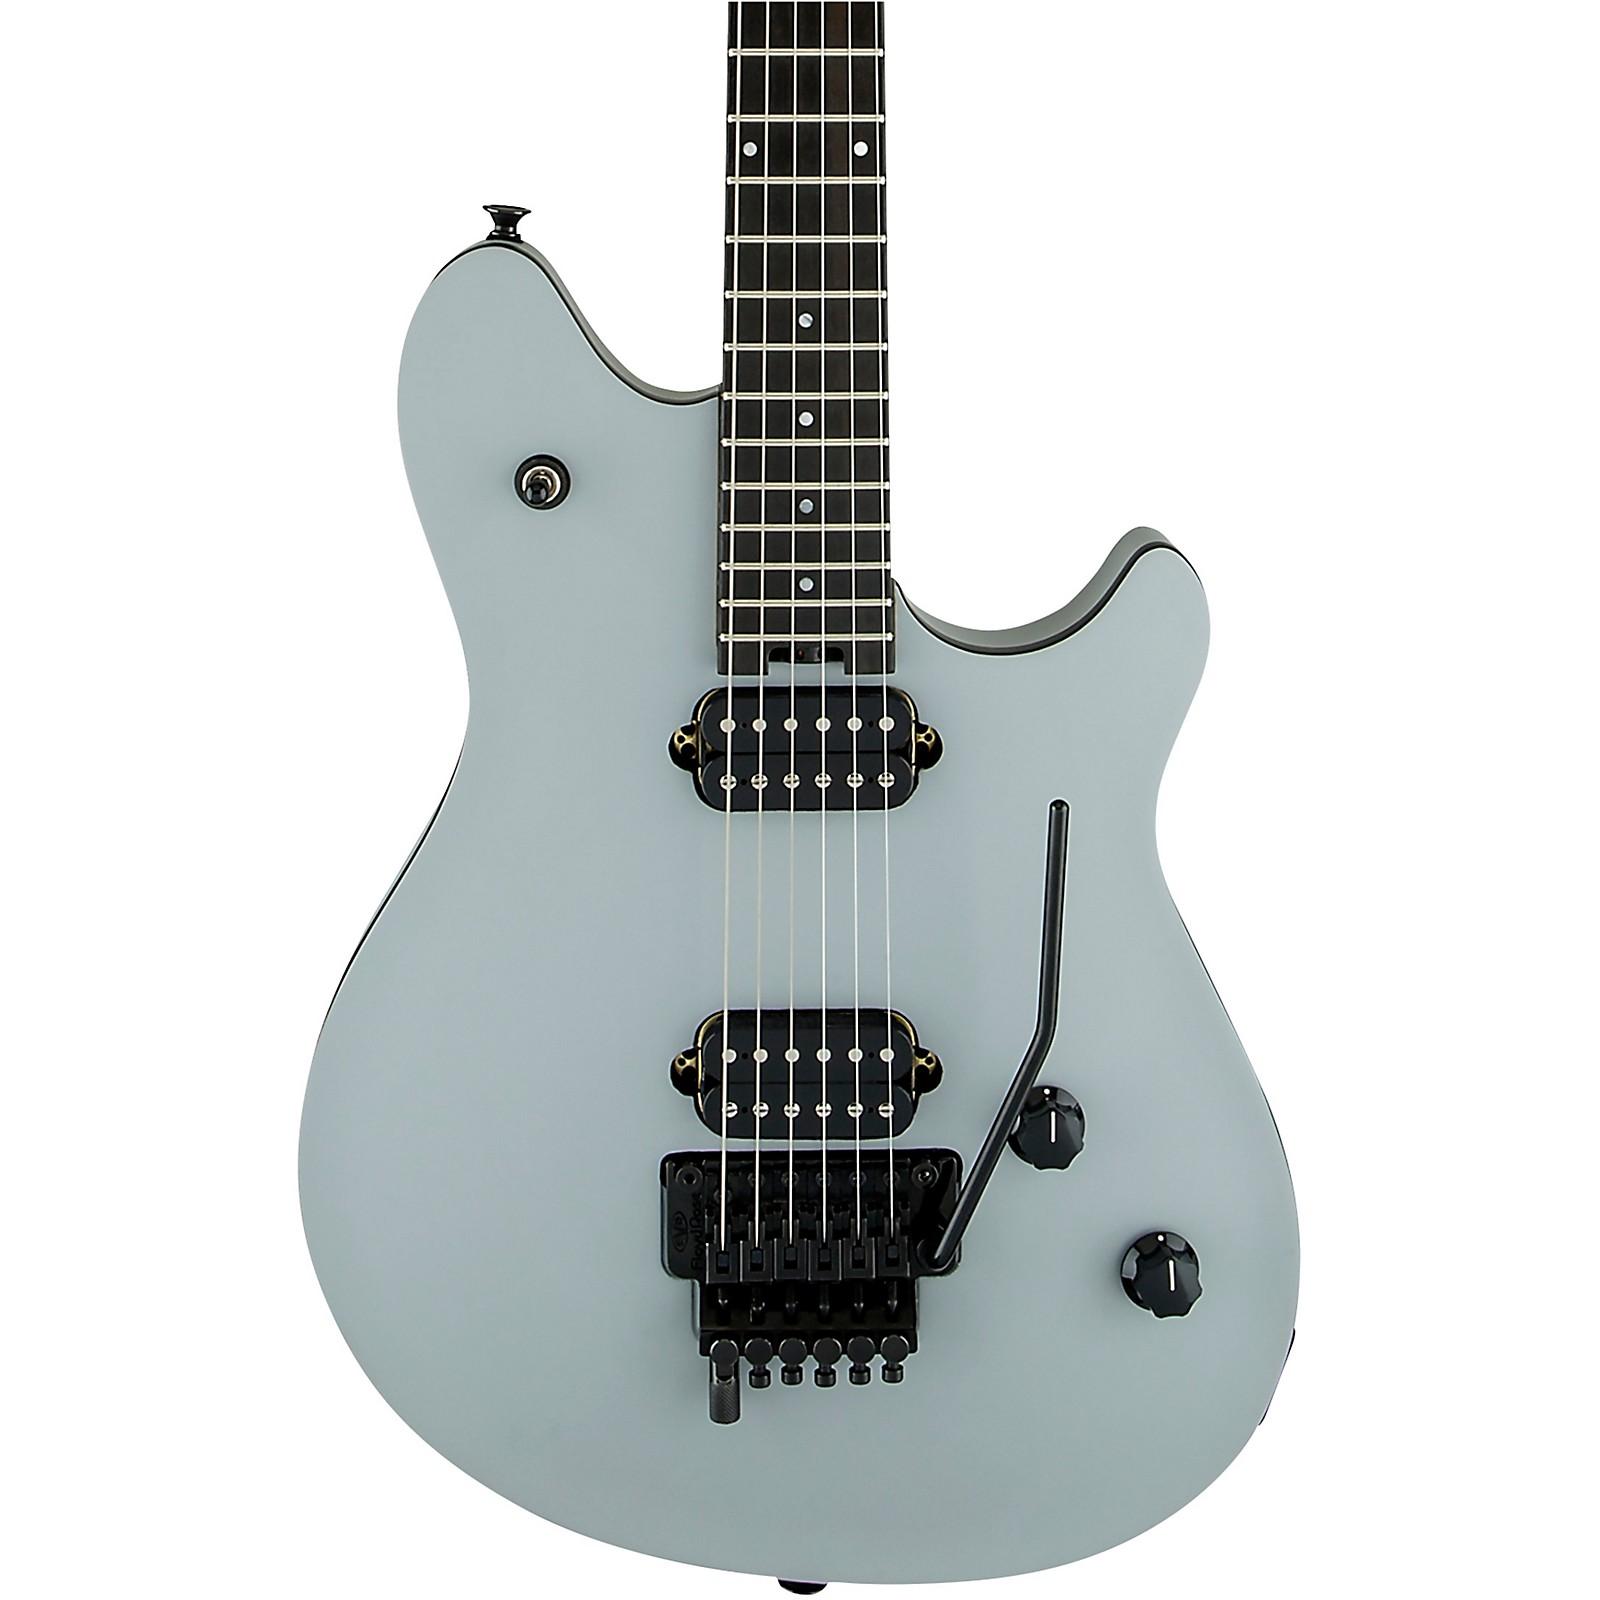 EVH Wolfgang Special Ebony Fingerboard Electric Guitar